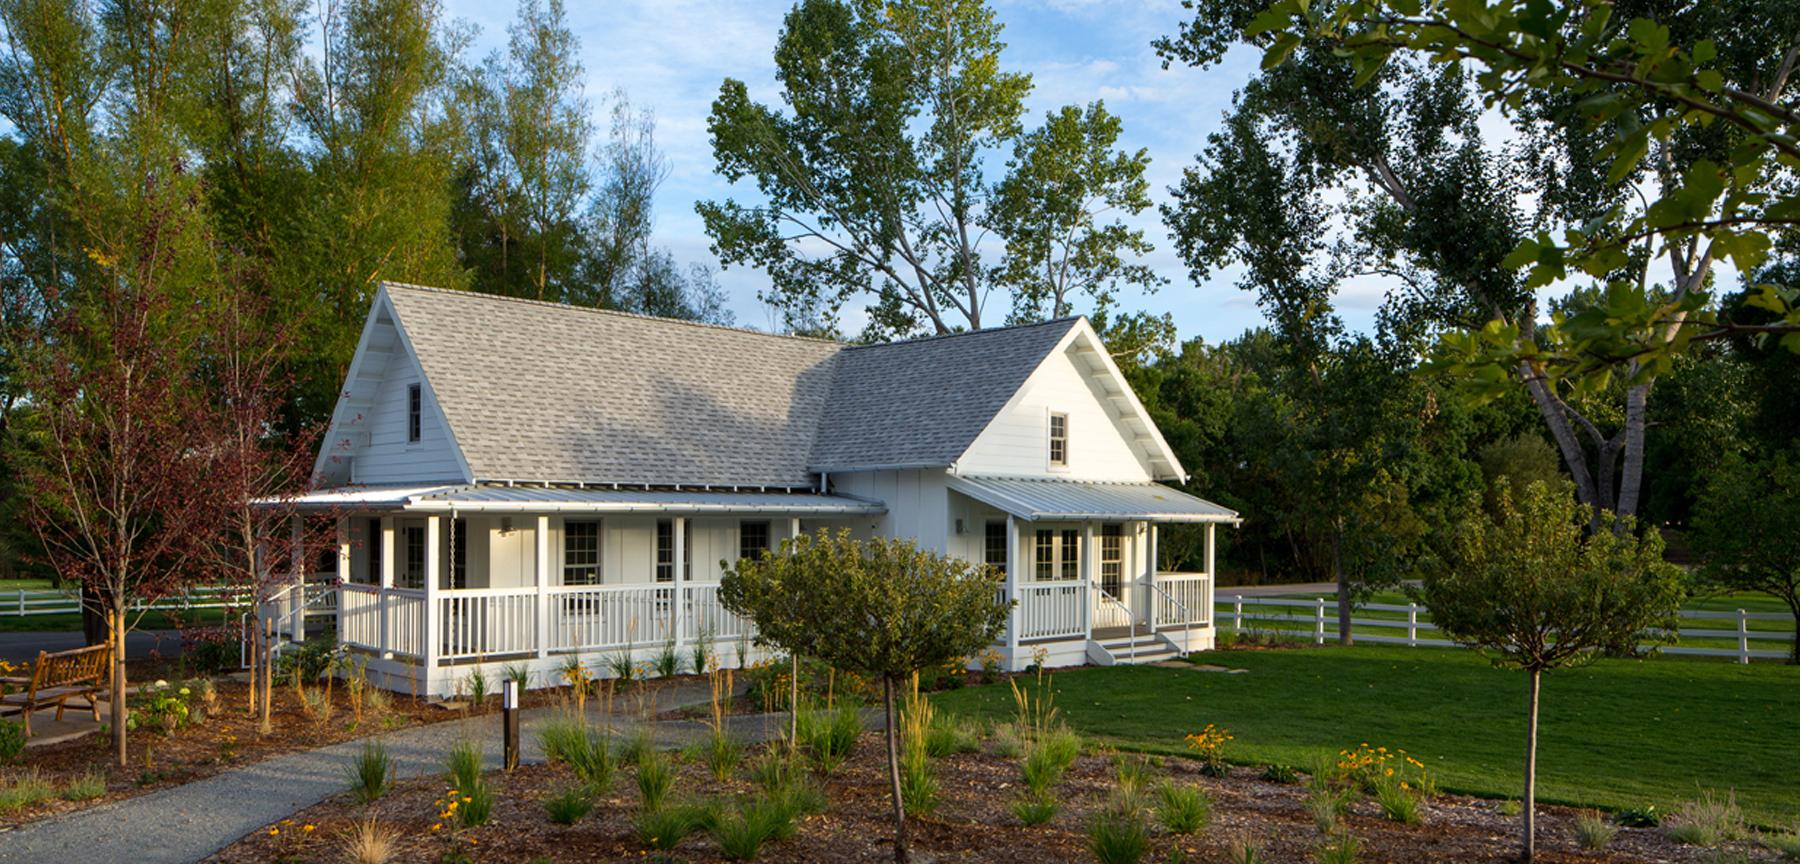 The Barn at Raccoon Creek bridal cottage